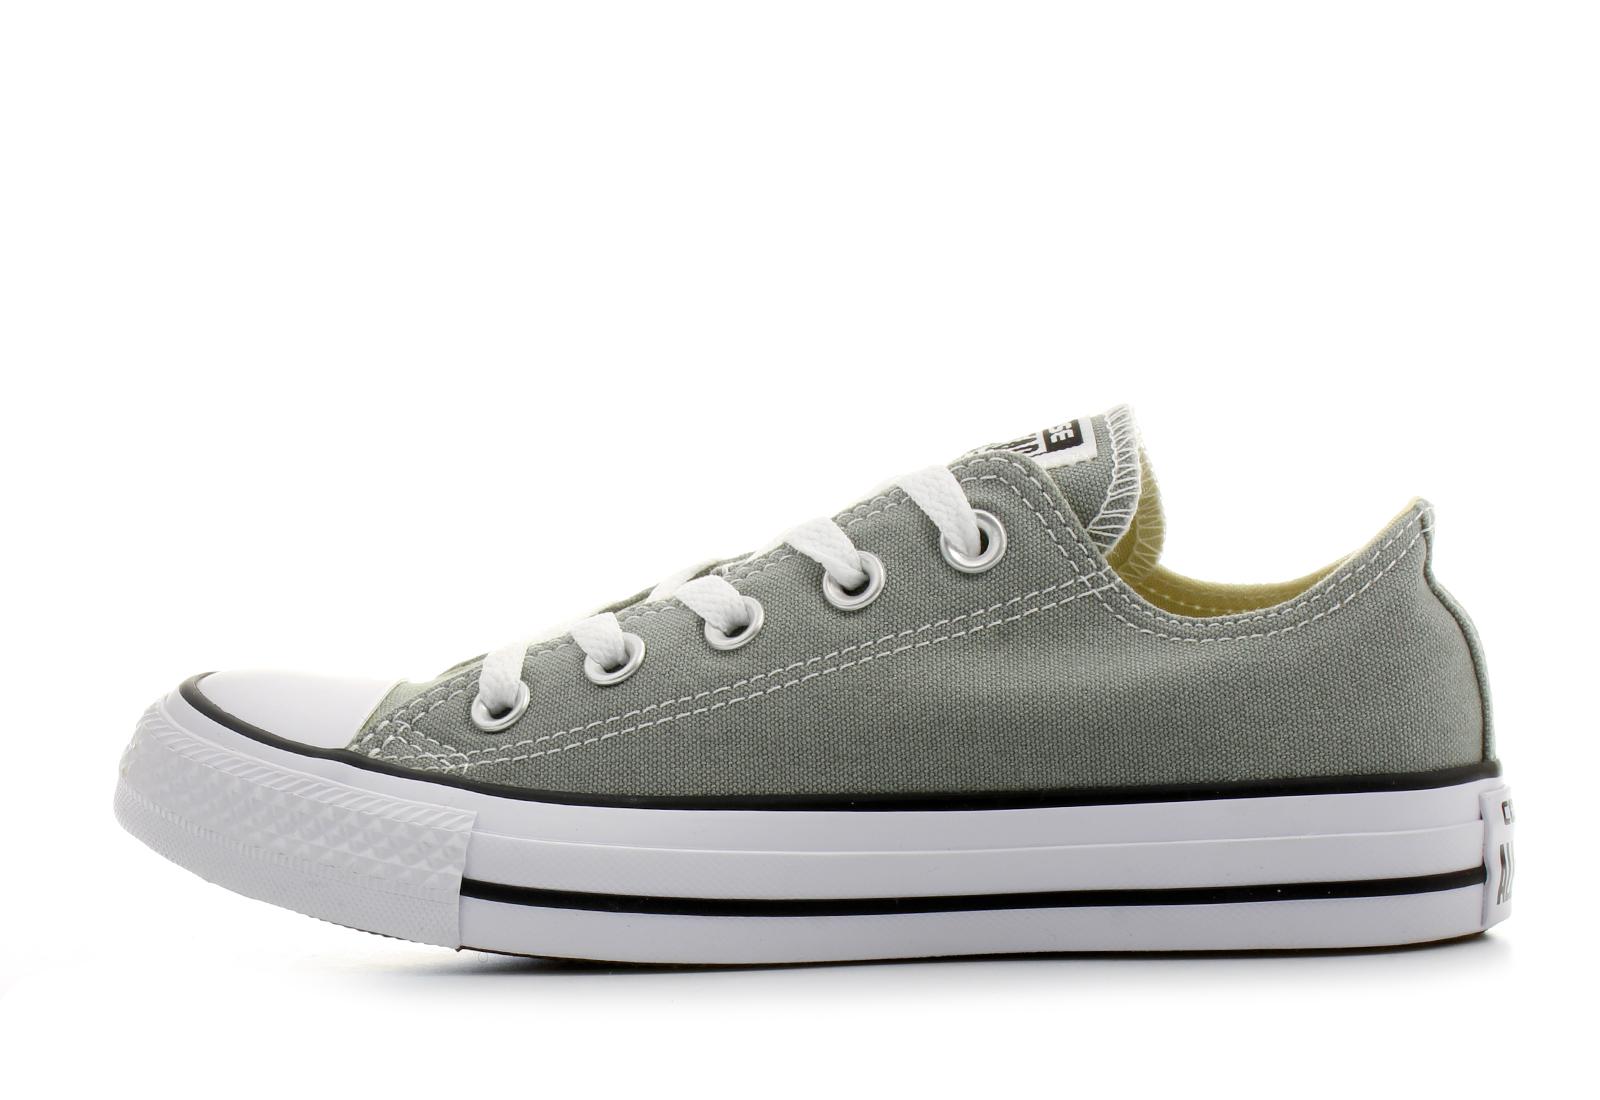 600d4c214add1c Converse Sneakers - Chuck Taylor All Star Seasonal Ox - 155575C ...